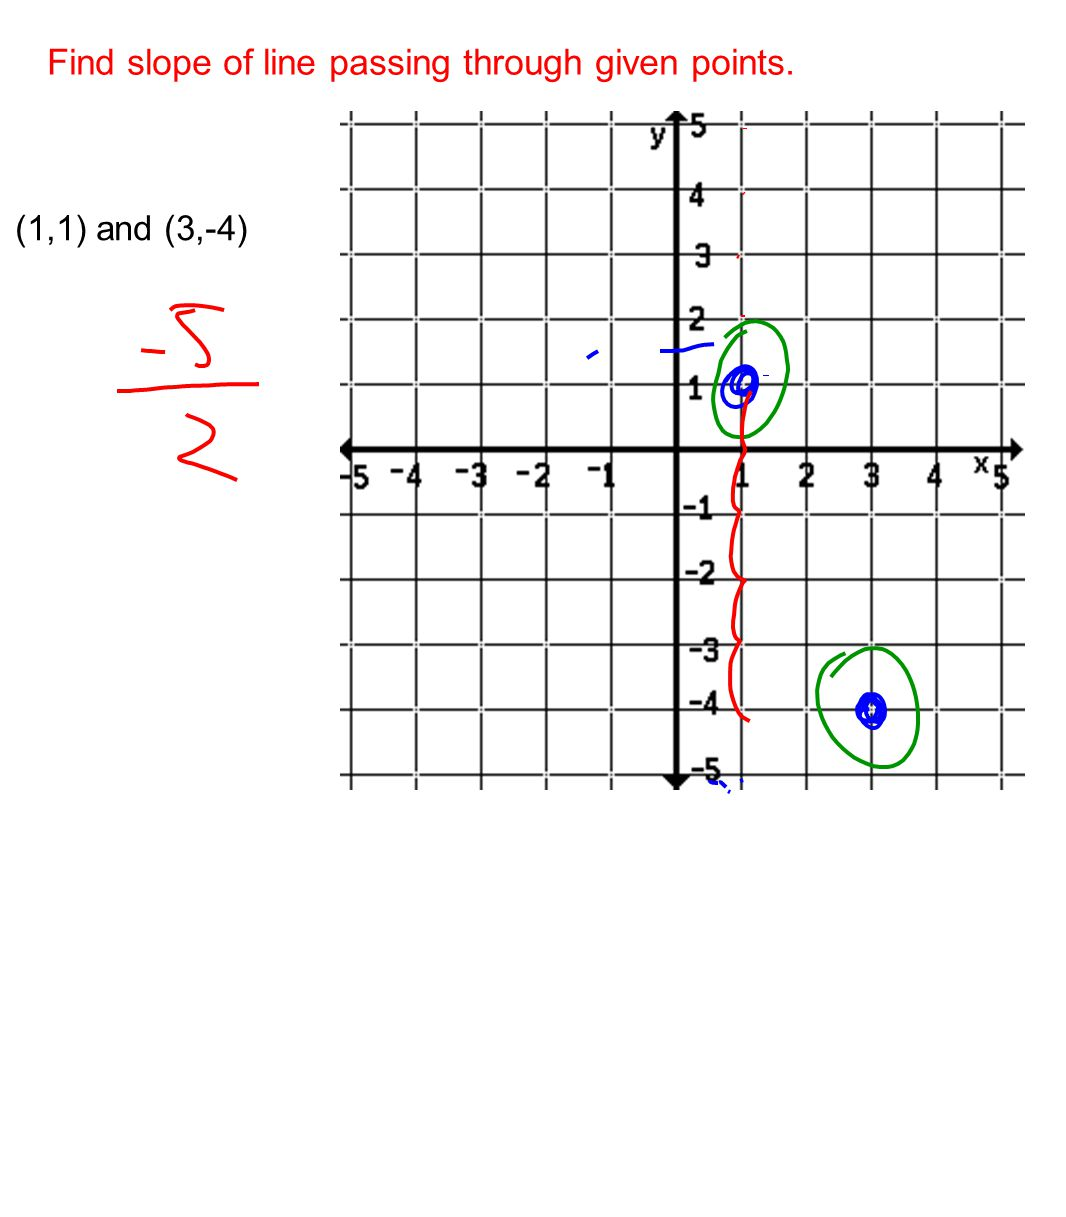 Unit 2 Inequality Quiz 2 3n 7 Gt 5n 3 3x 5 Gt 5